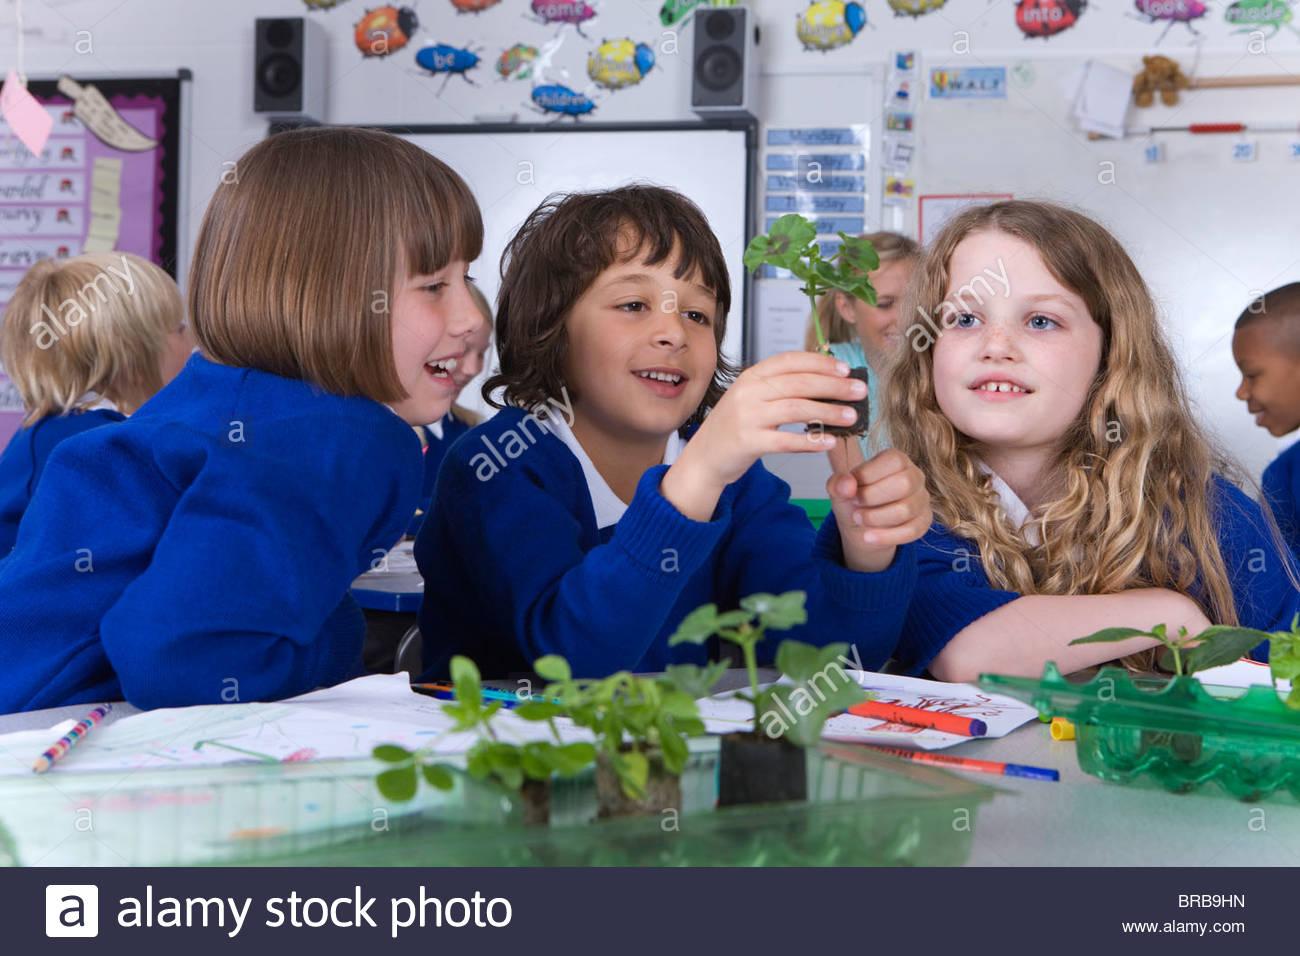 School children looking at plant seedlings on desk - Stock Image